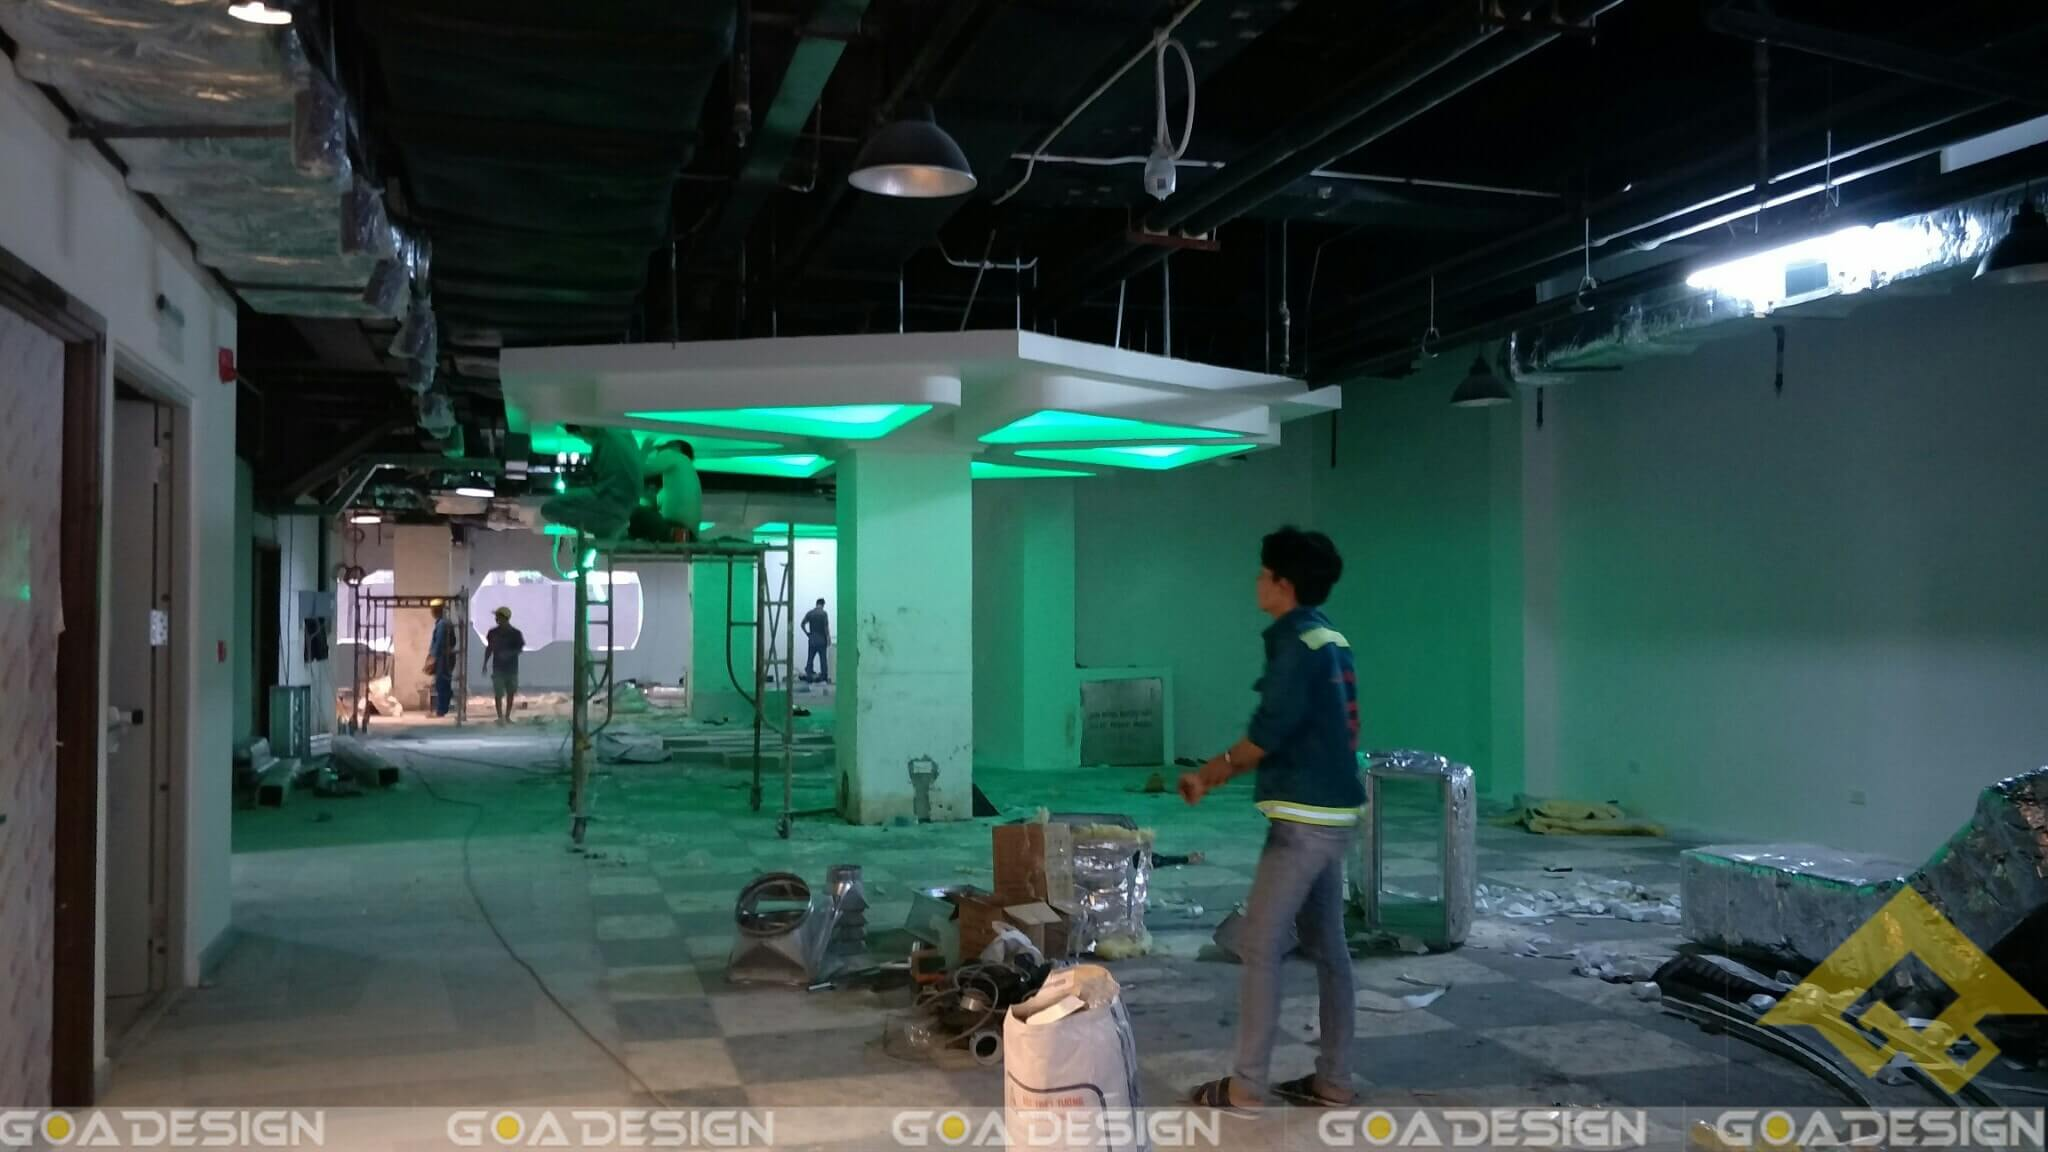 GOADESIGN Thiết Kế Khu Vui Chơi Garden Mall - Q5 (49)